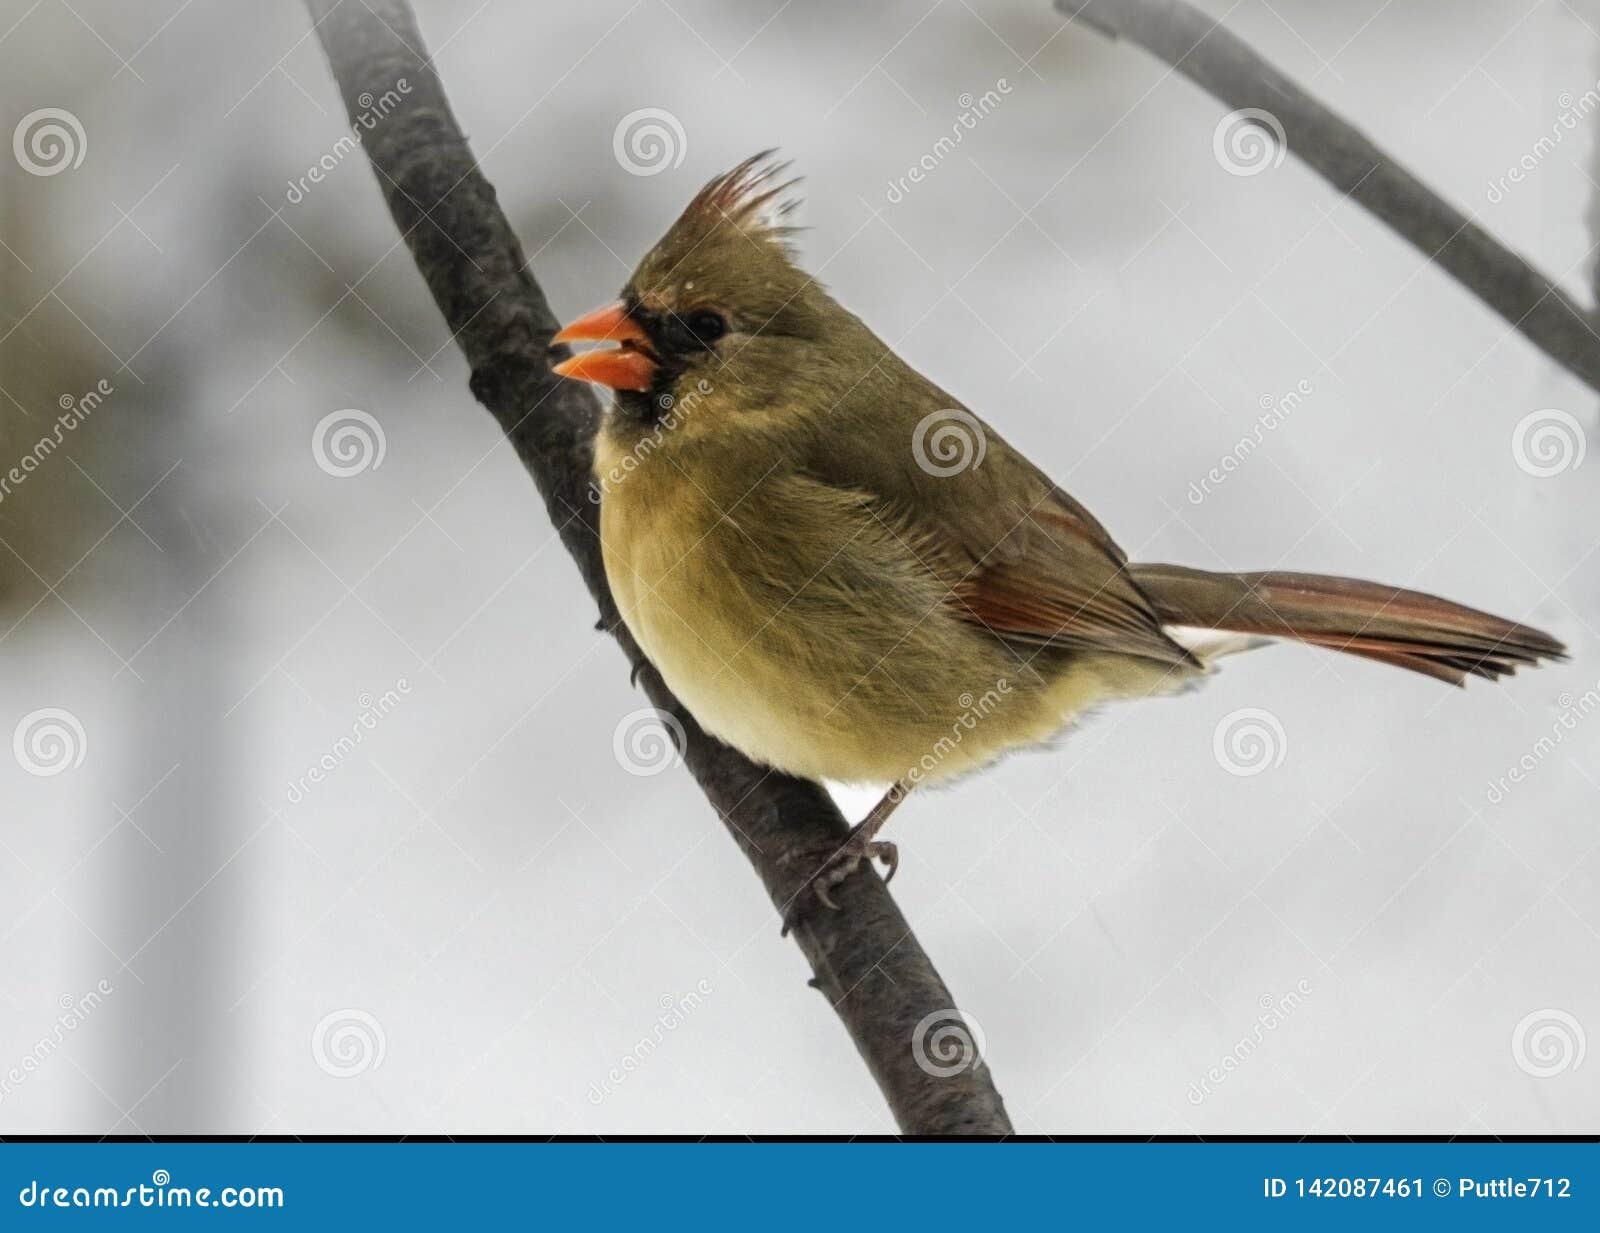 Braces Itself Against cardinal féminin la neige